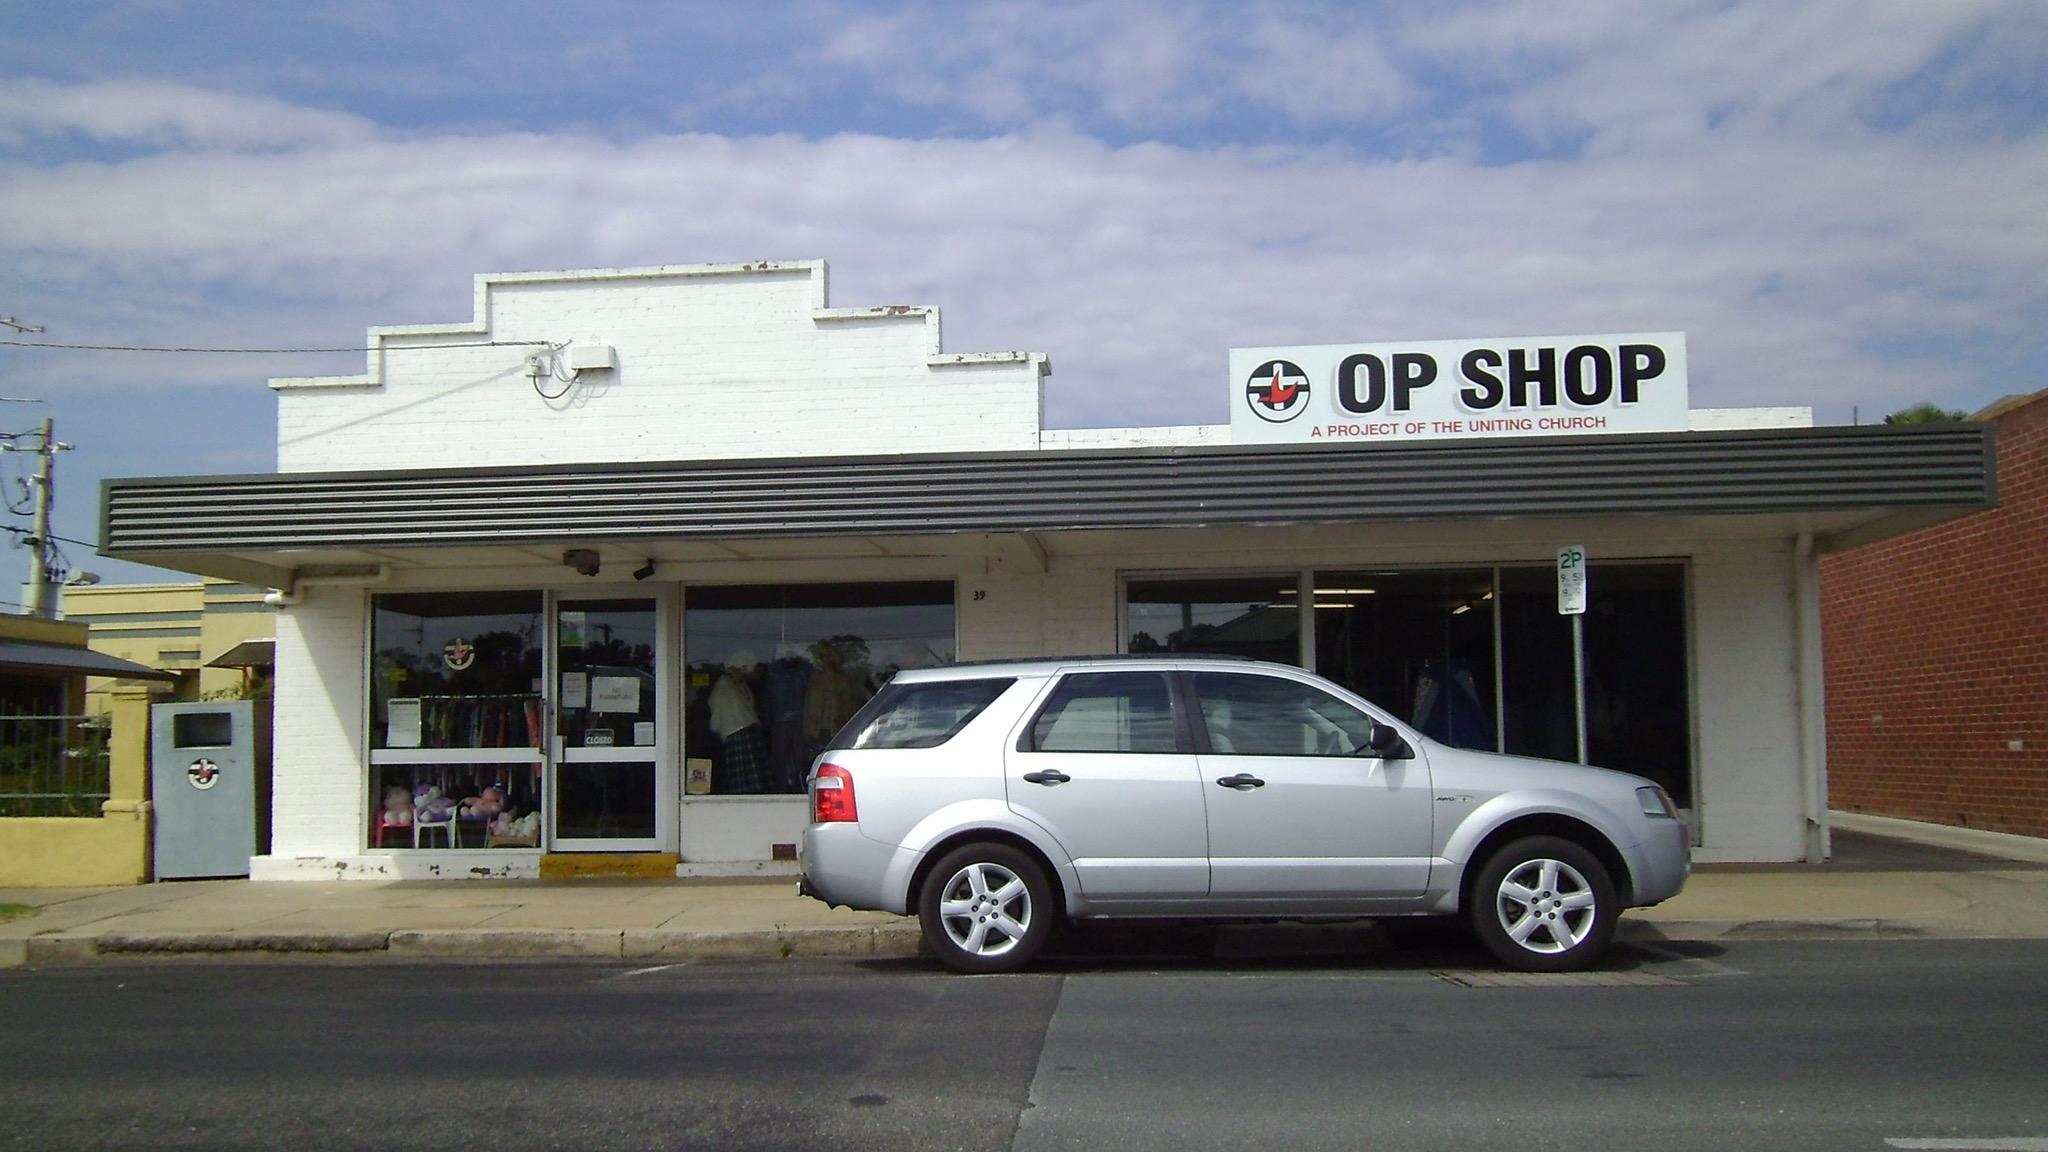 Uniting Church Opportunity Shop